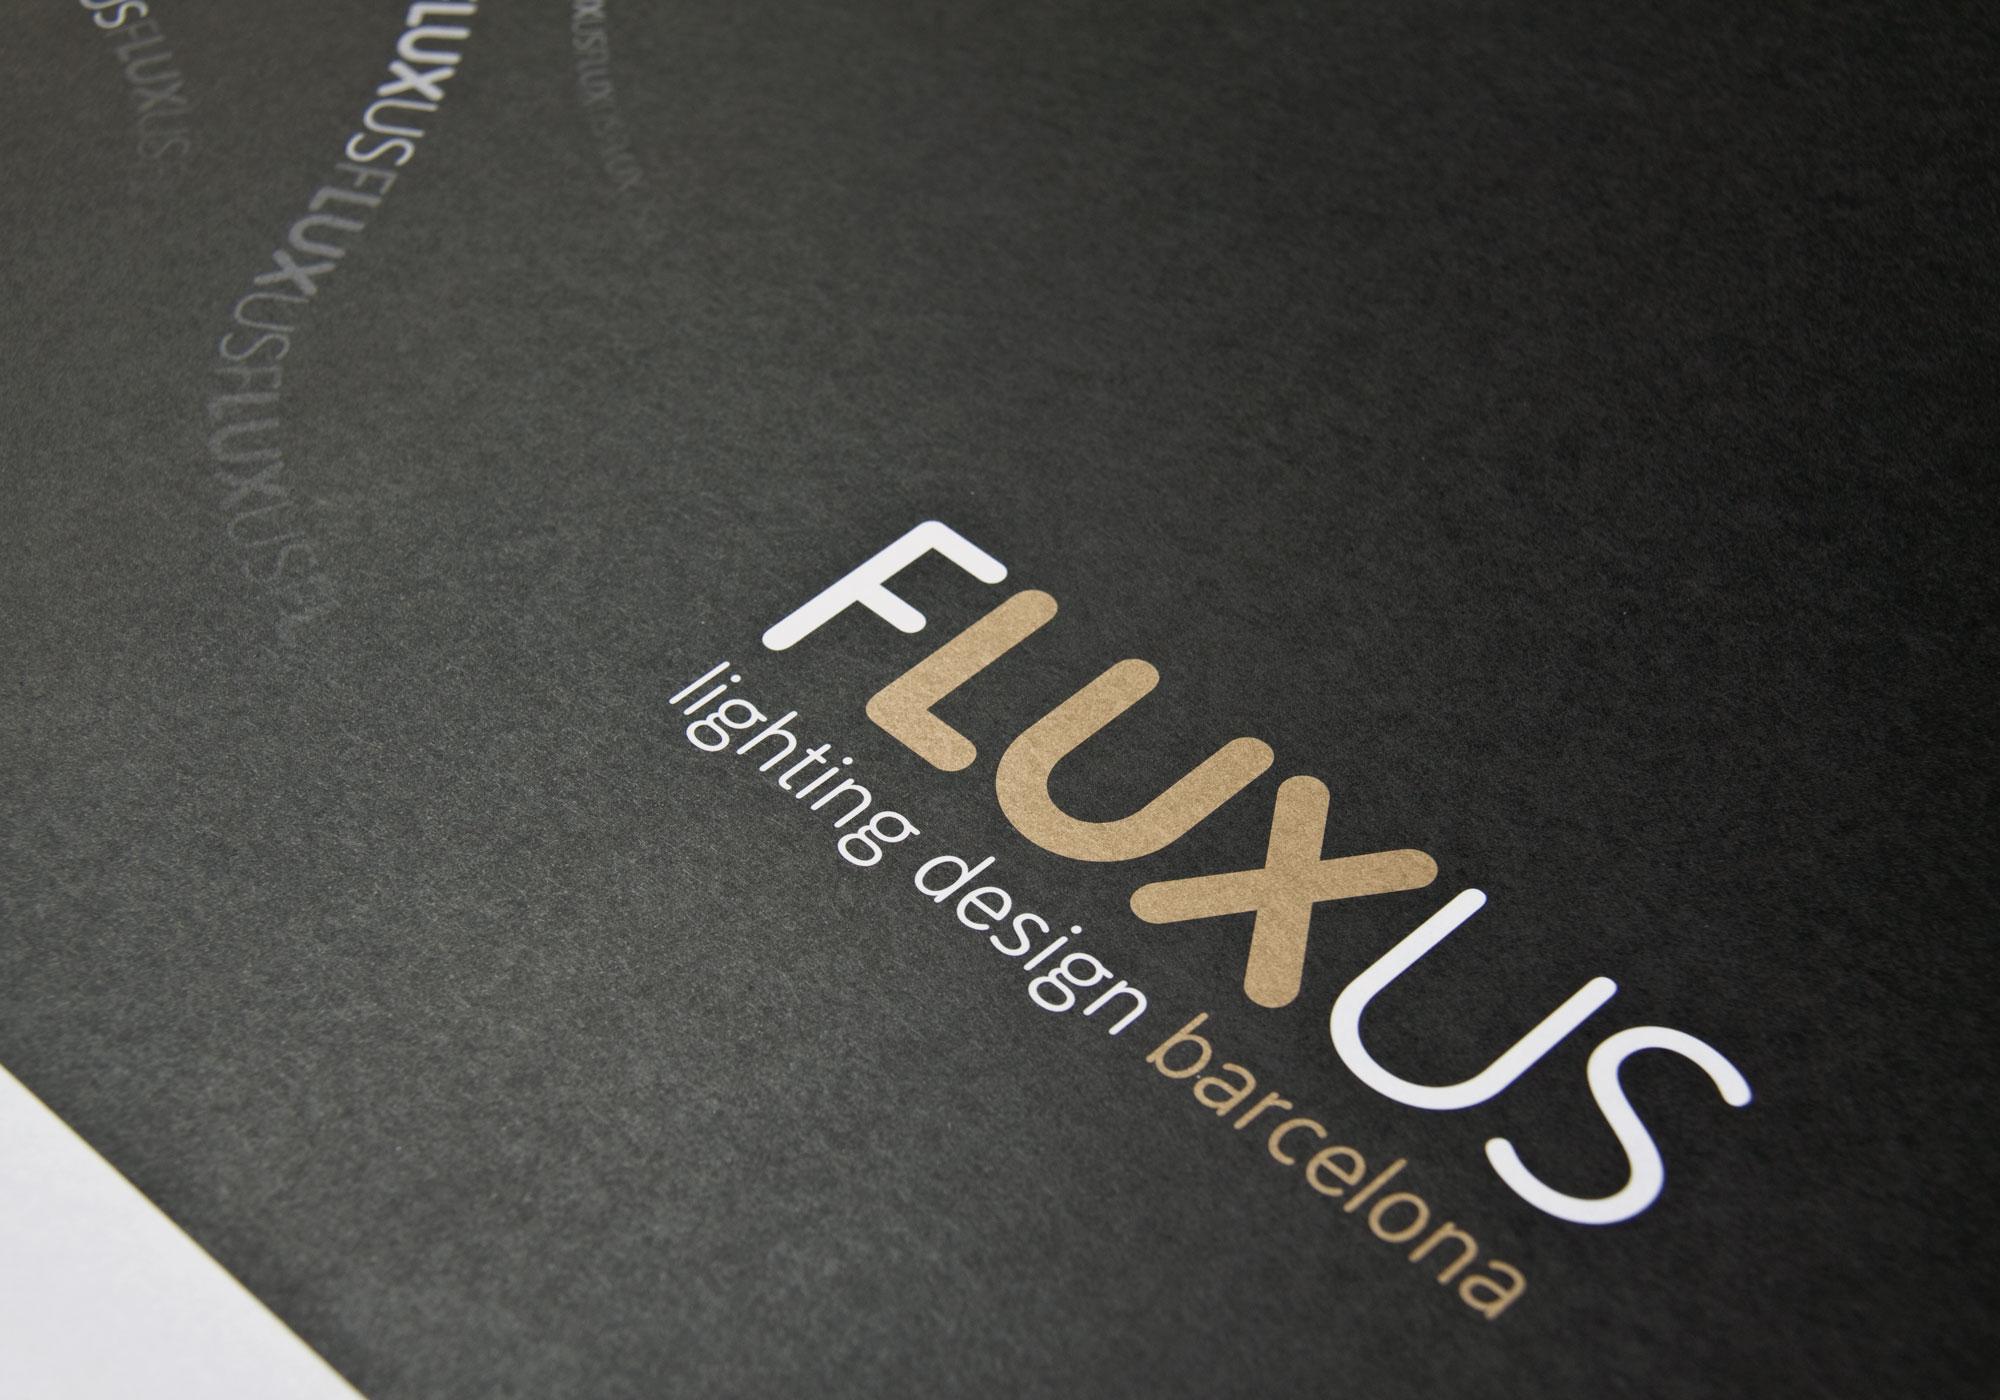 fluxus-stationary-detail-2